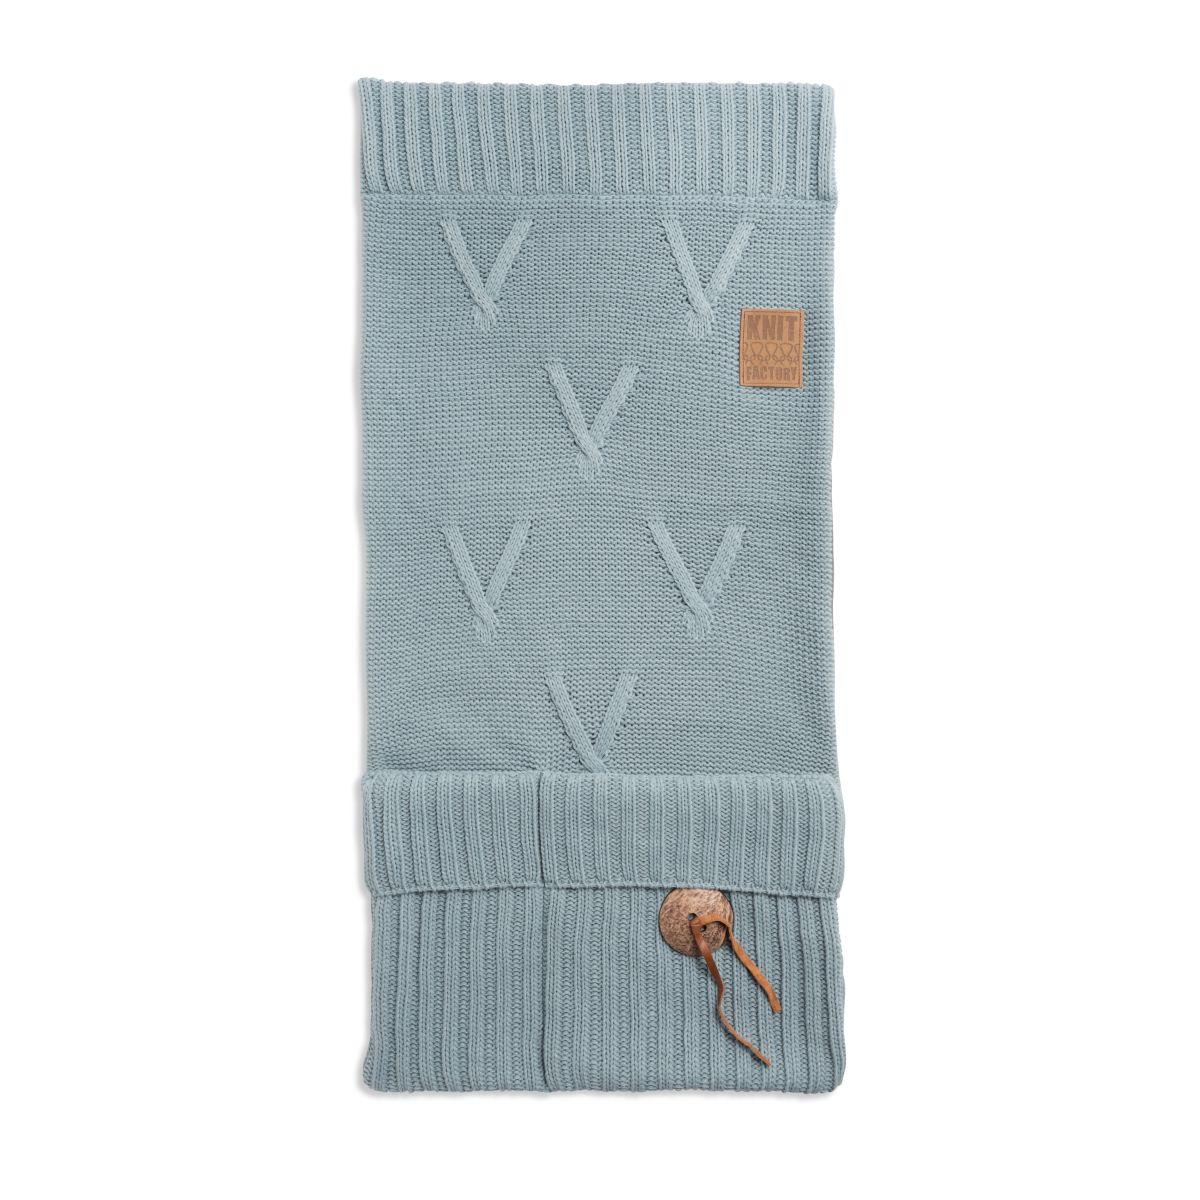 knit factory 1101009 pocket aran stone green